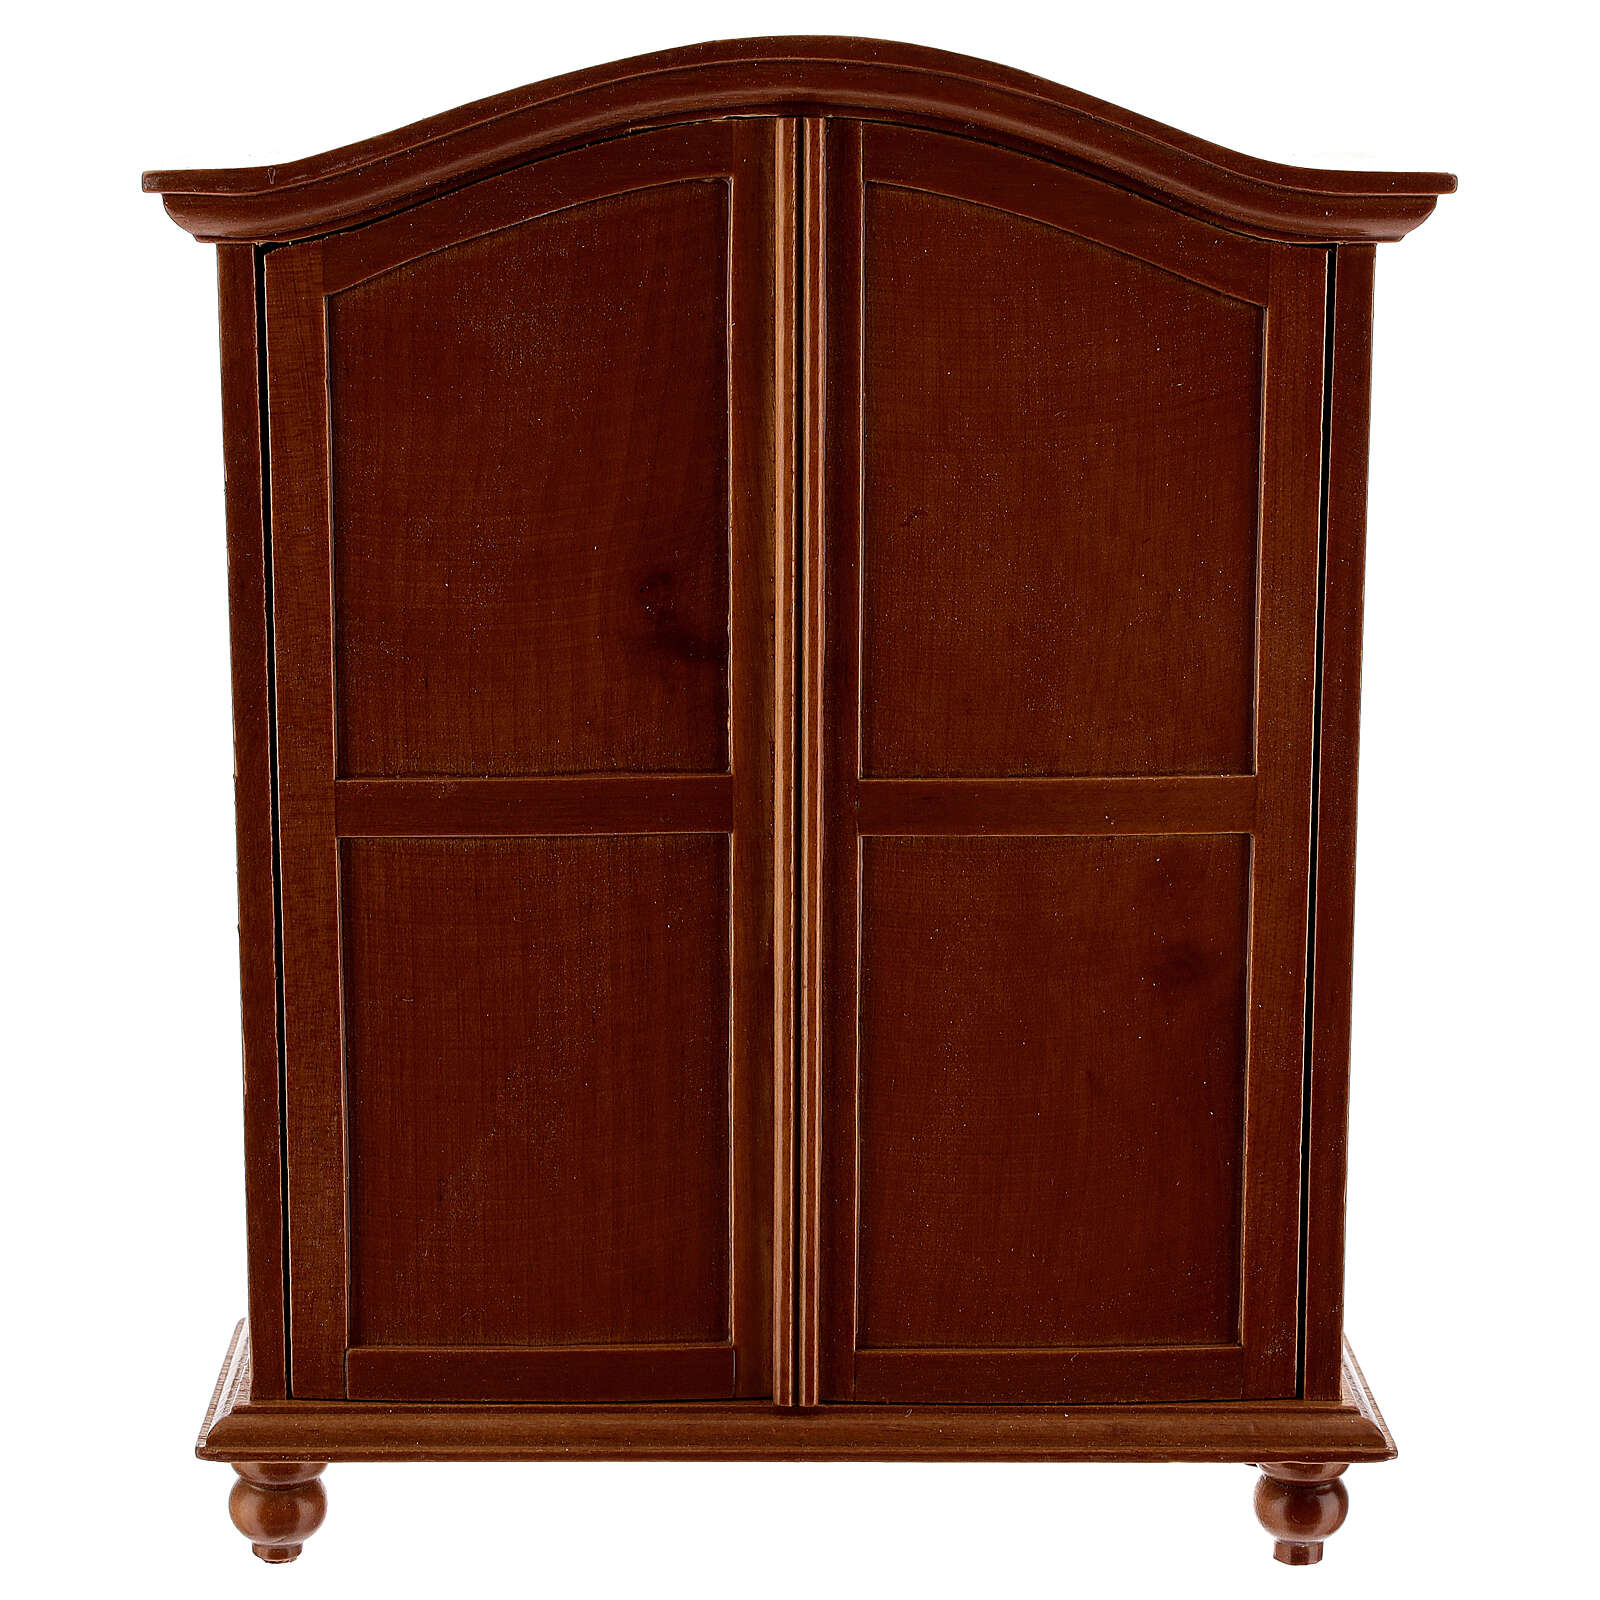 Classic wood wardrobe 20x15x5 cm for Nativity Scene with 12-14 cm figurines 4